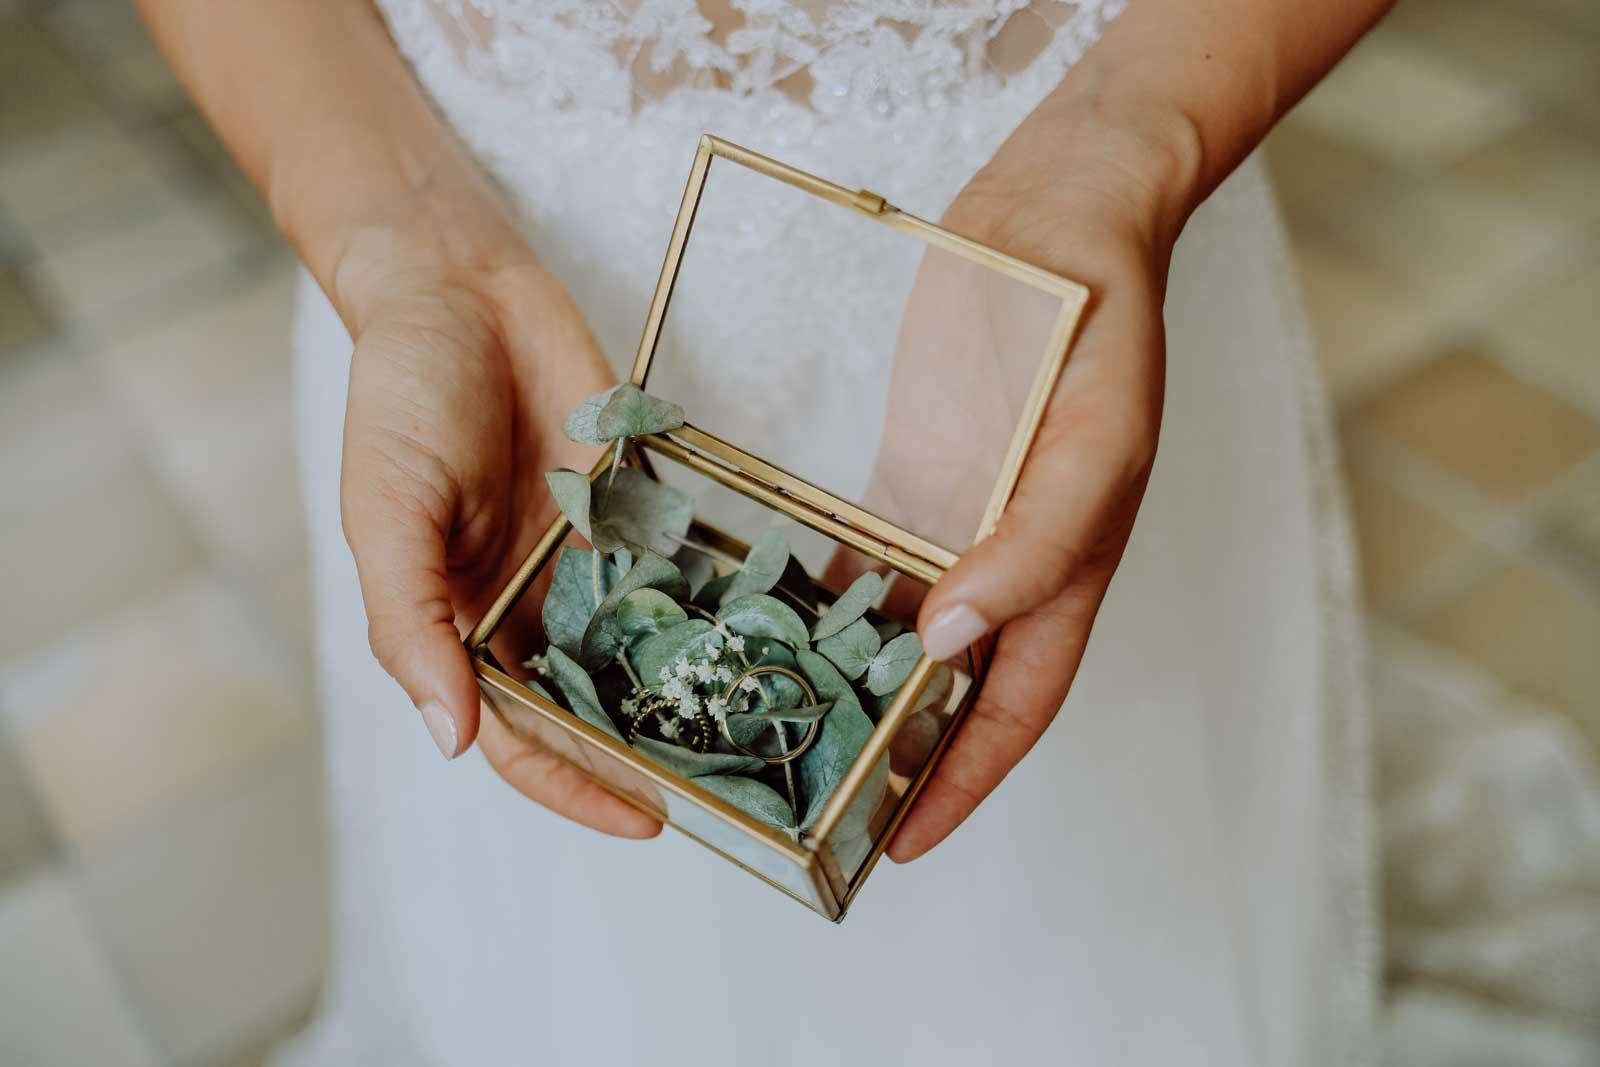 Frau hält Eheringe in ihrer Hand